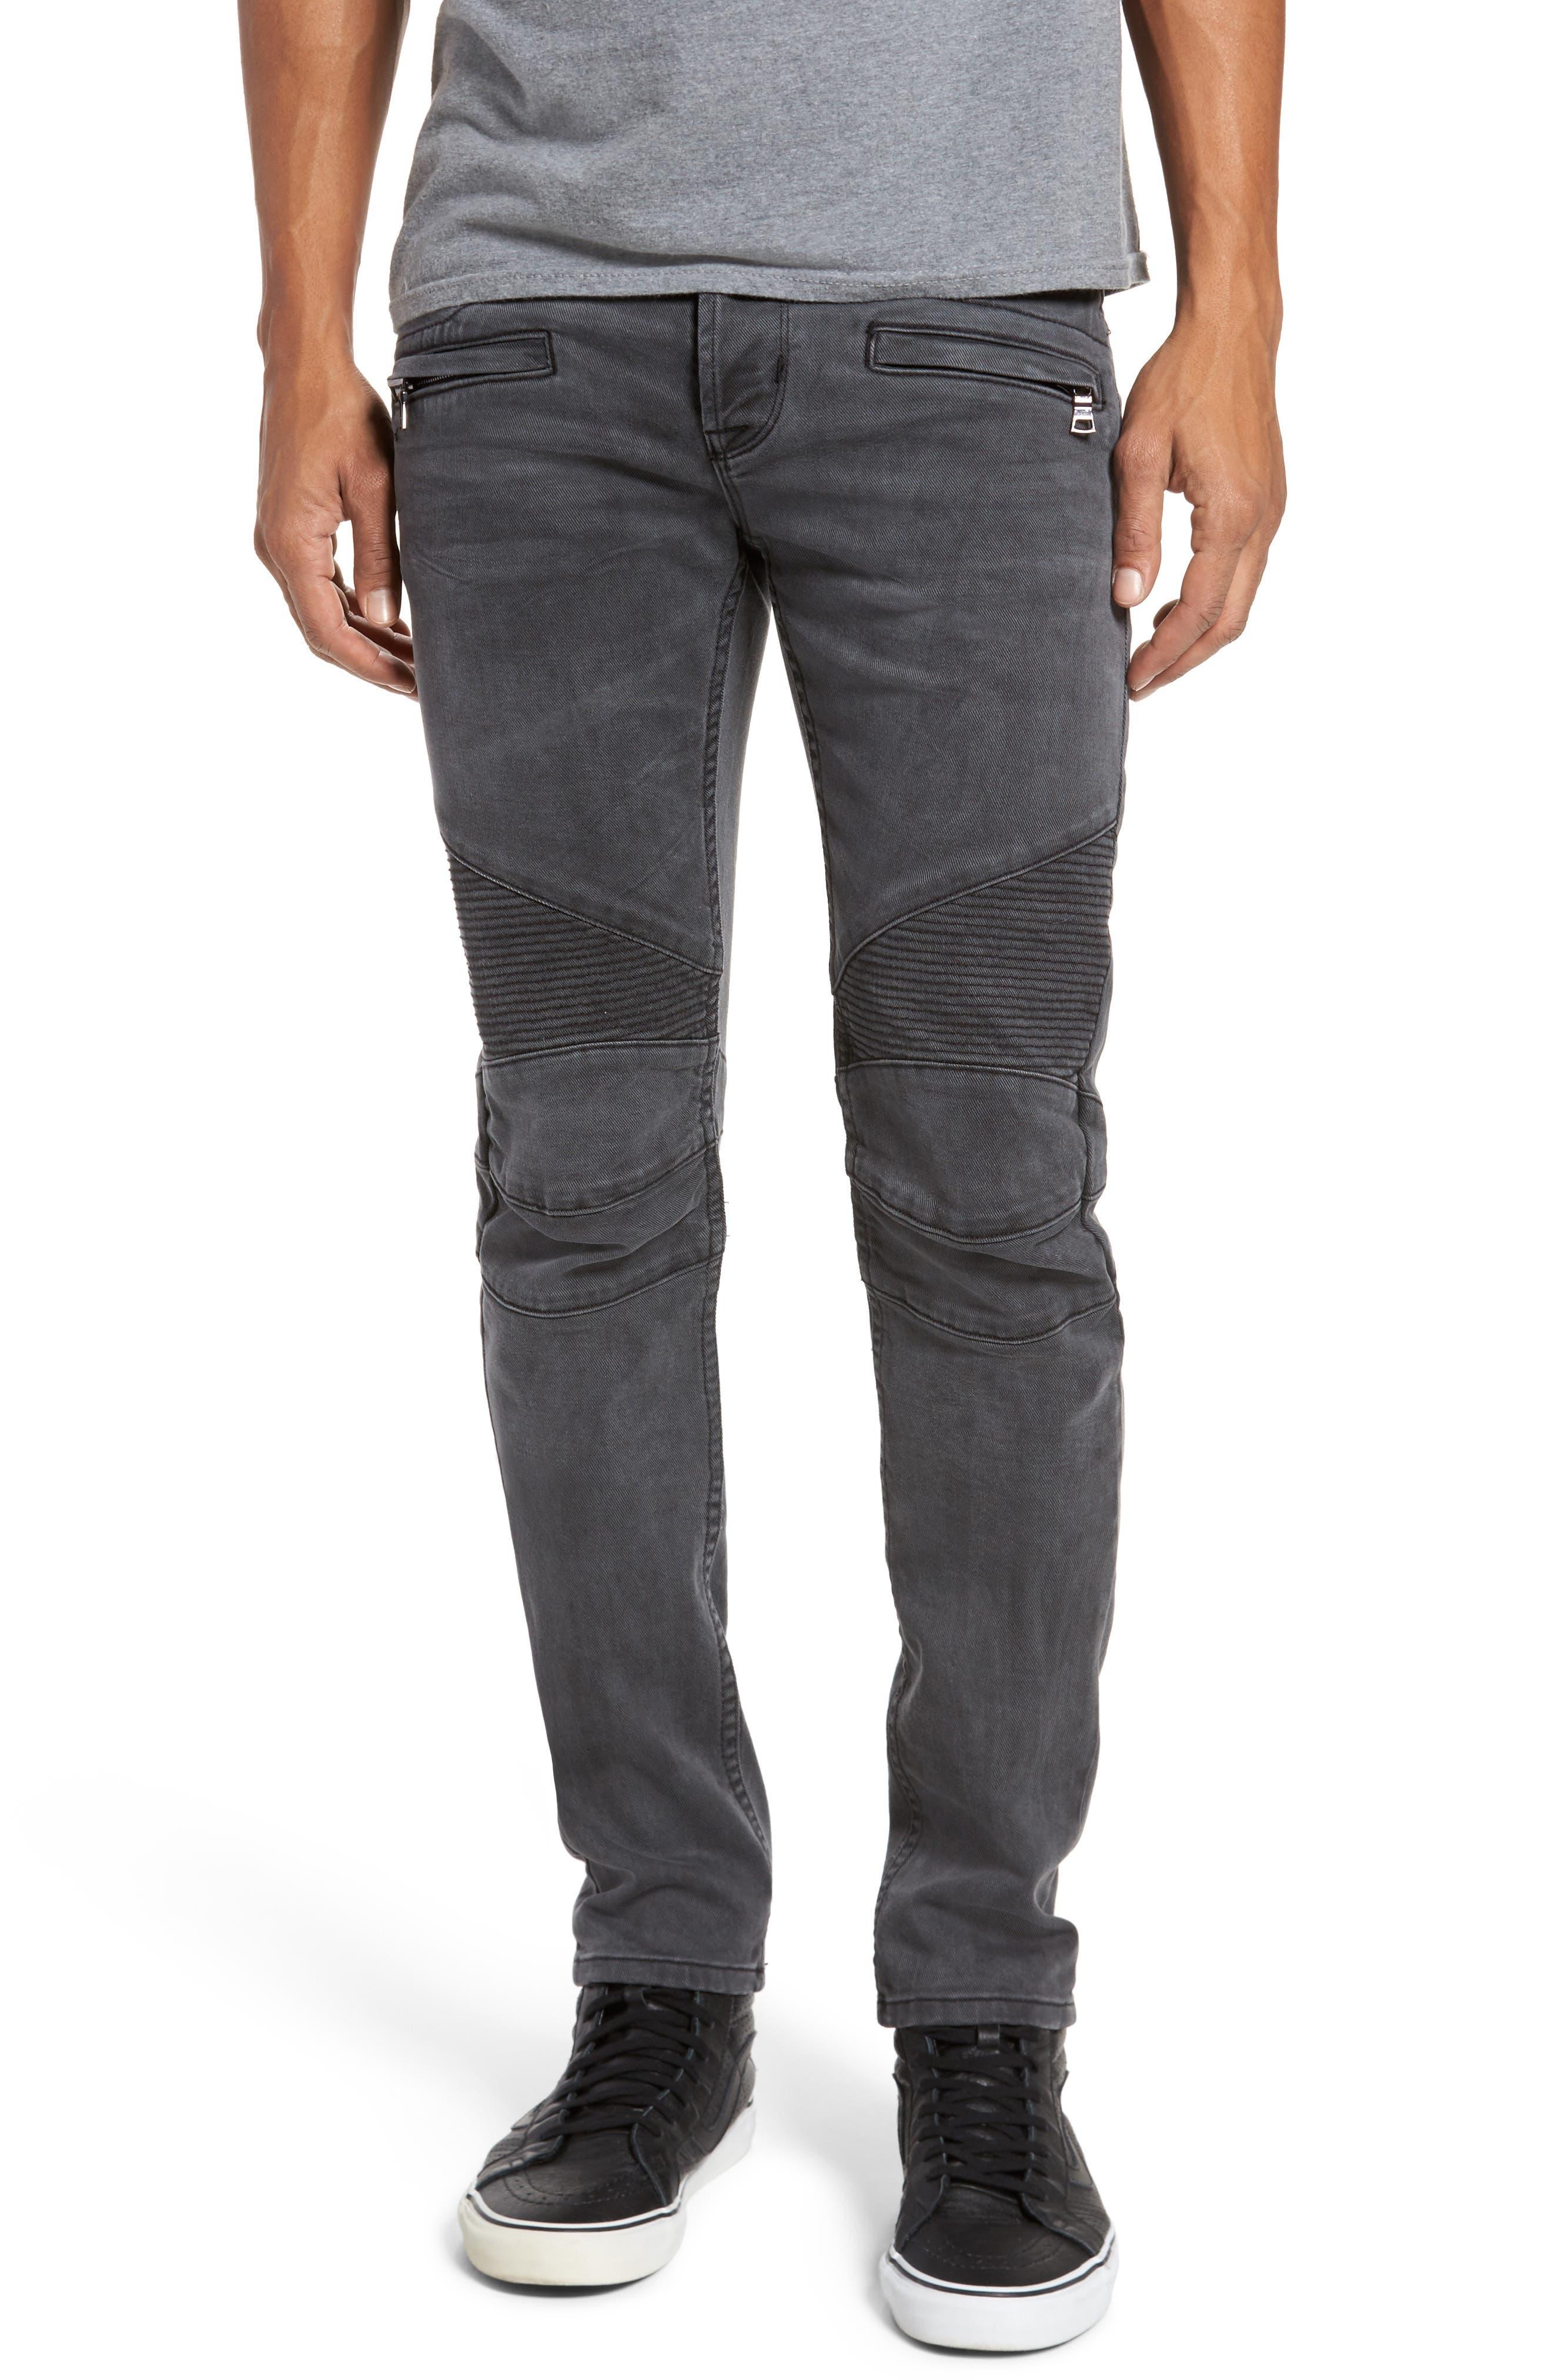 Hudson mens slim bootcut jeans